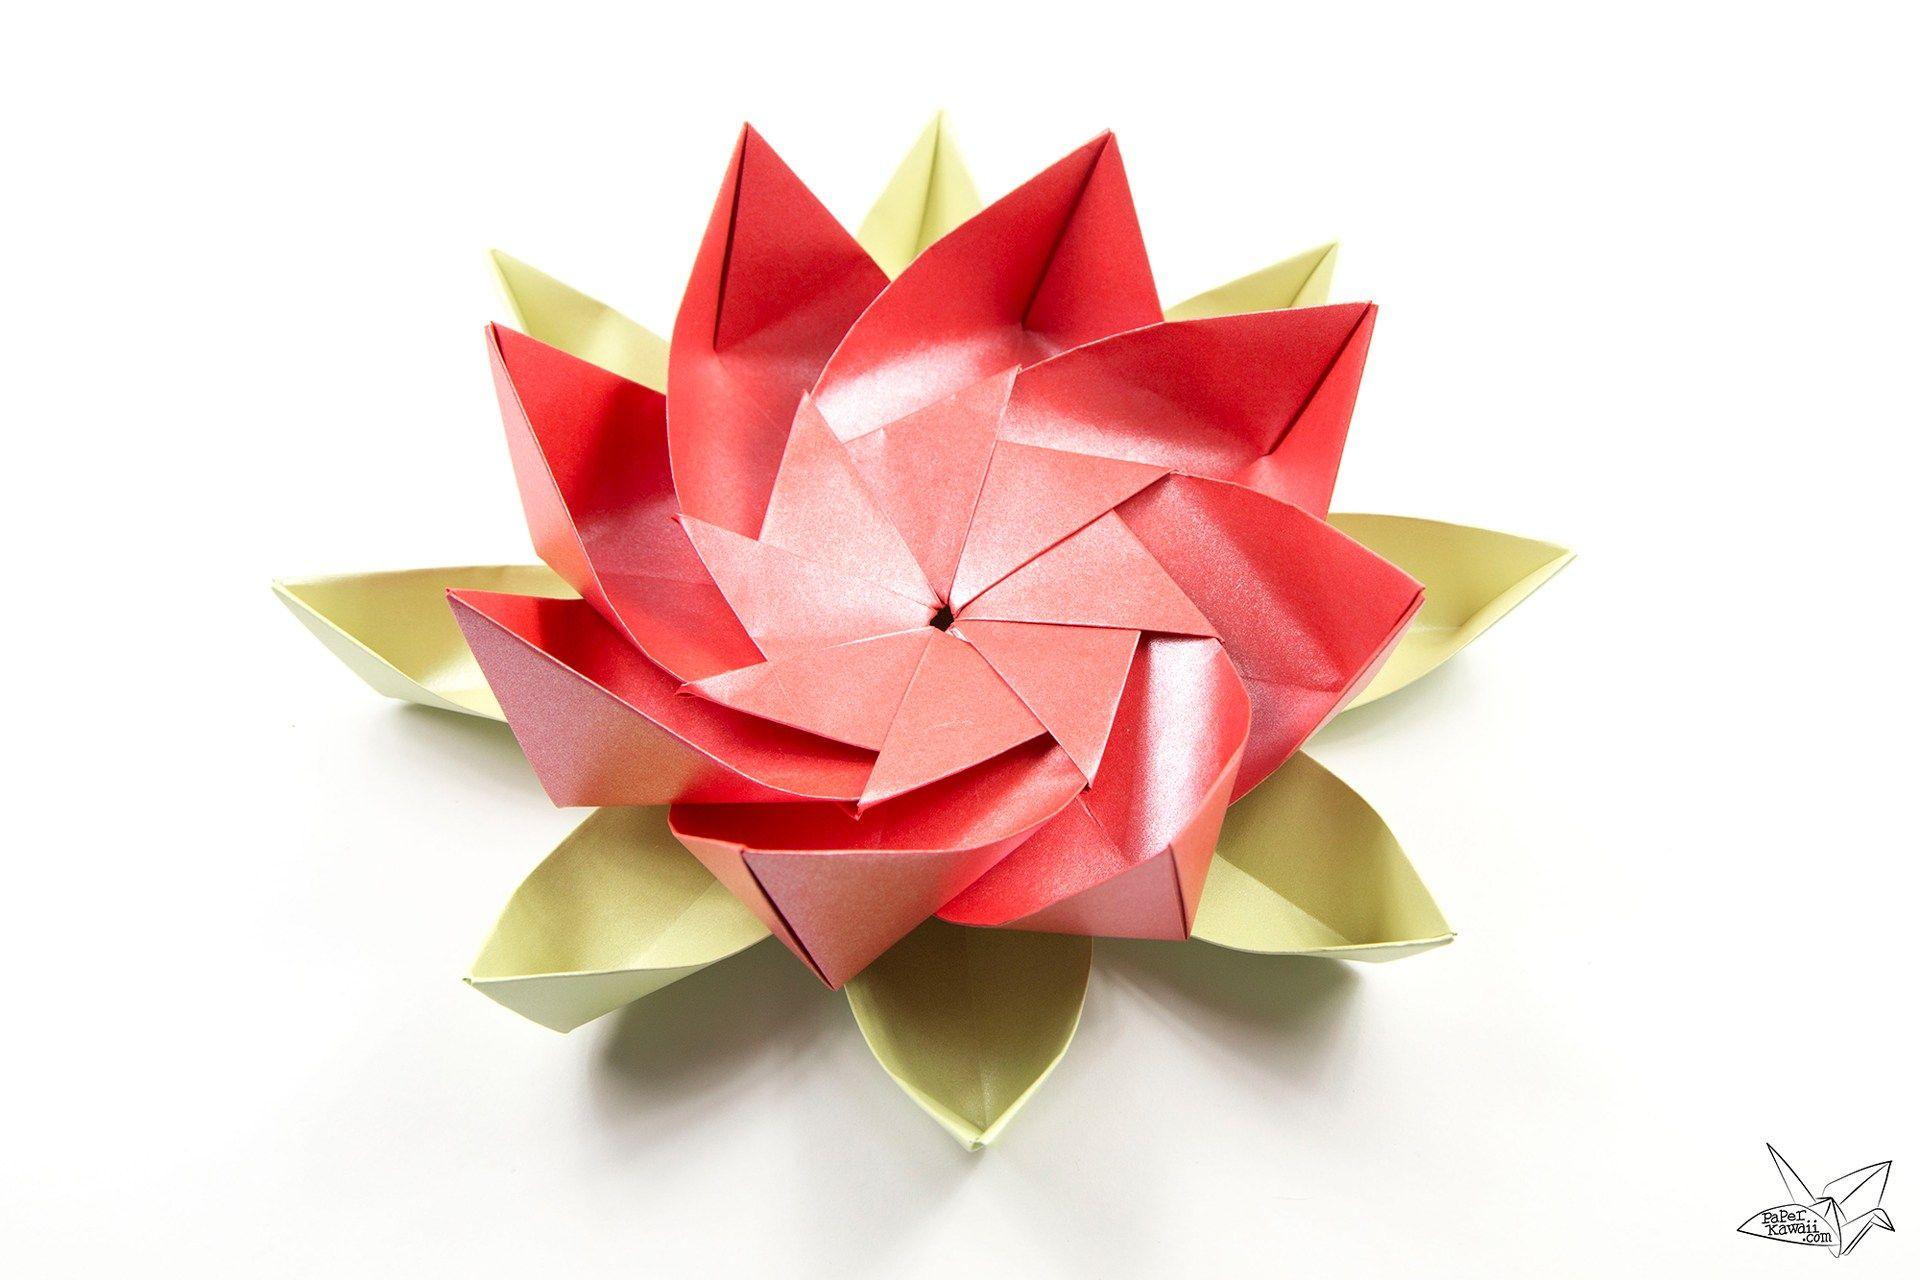 Modular Origami Lotus Flower With 8 Petals Tutorial Pinterest